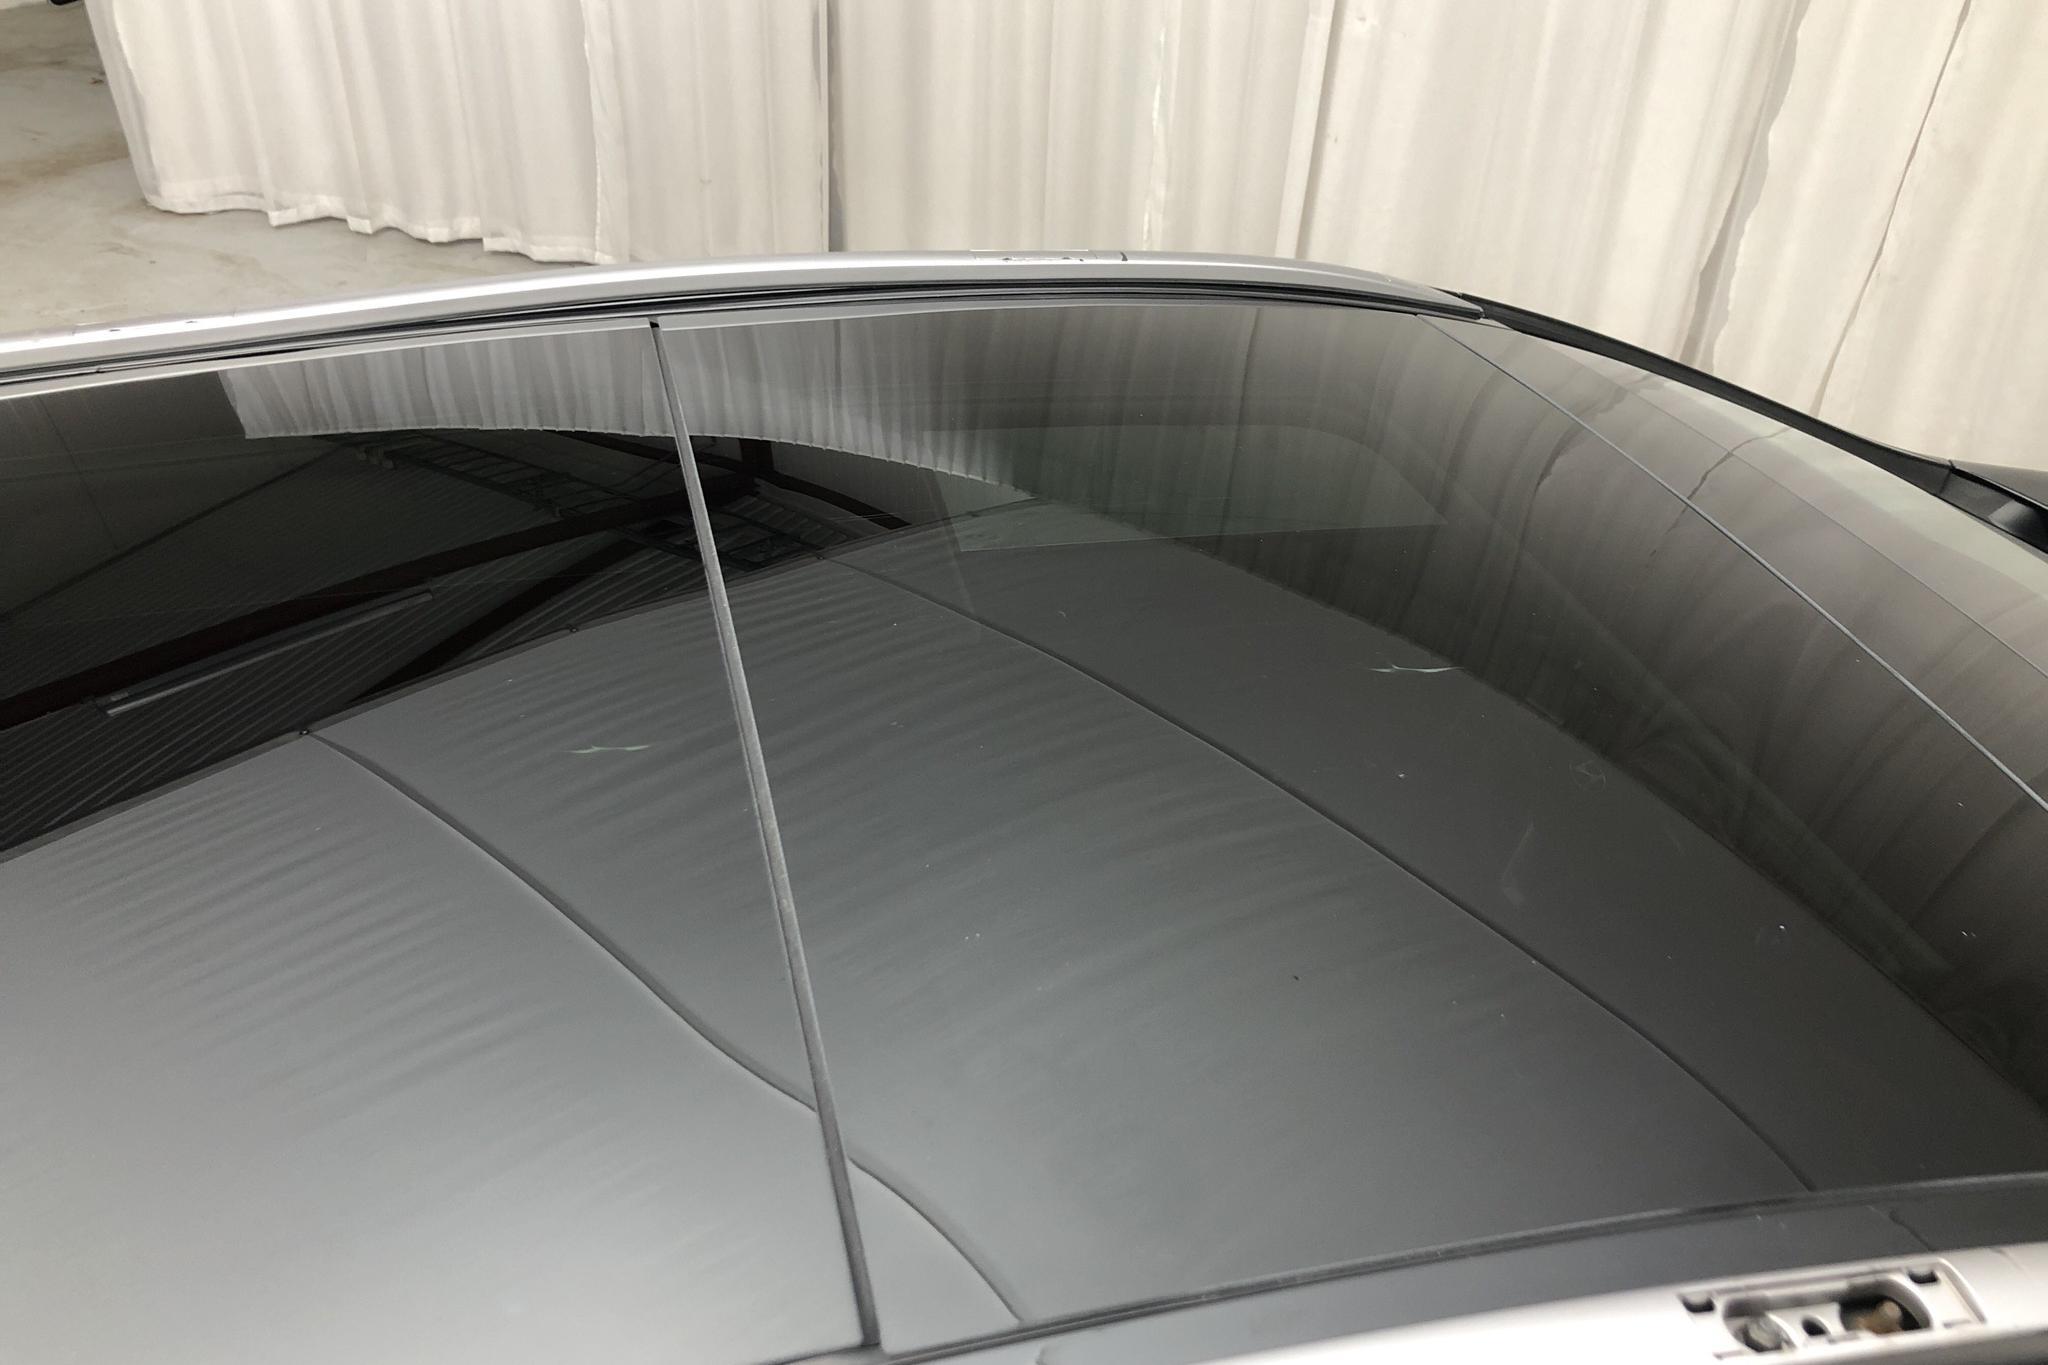 Hyundai i40 1.7 CRDi Kombi (136hk) - 163 470 km - Manual - black - 2012